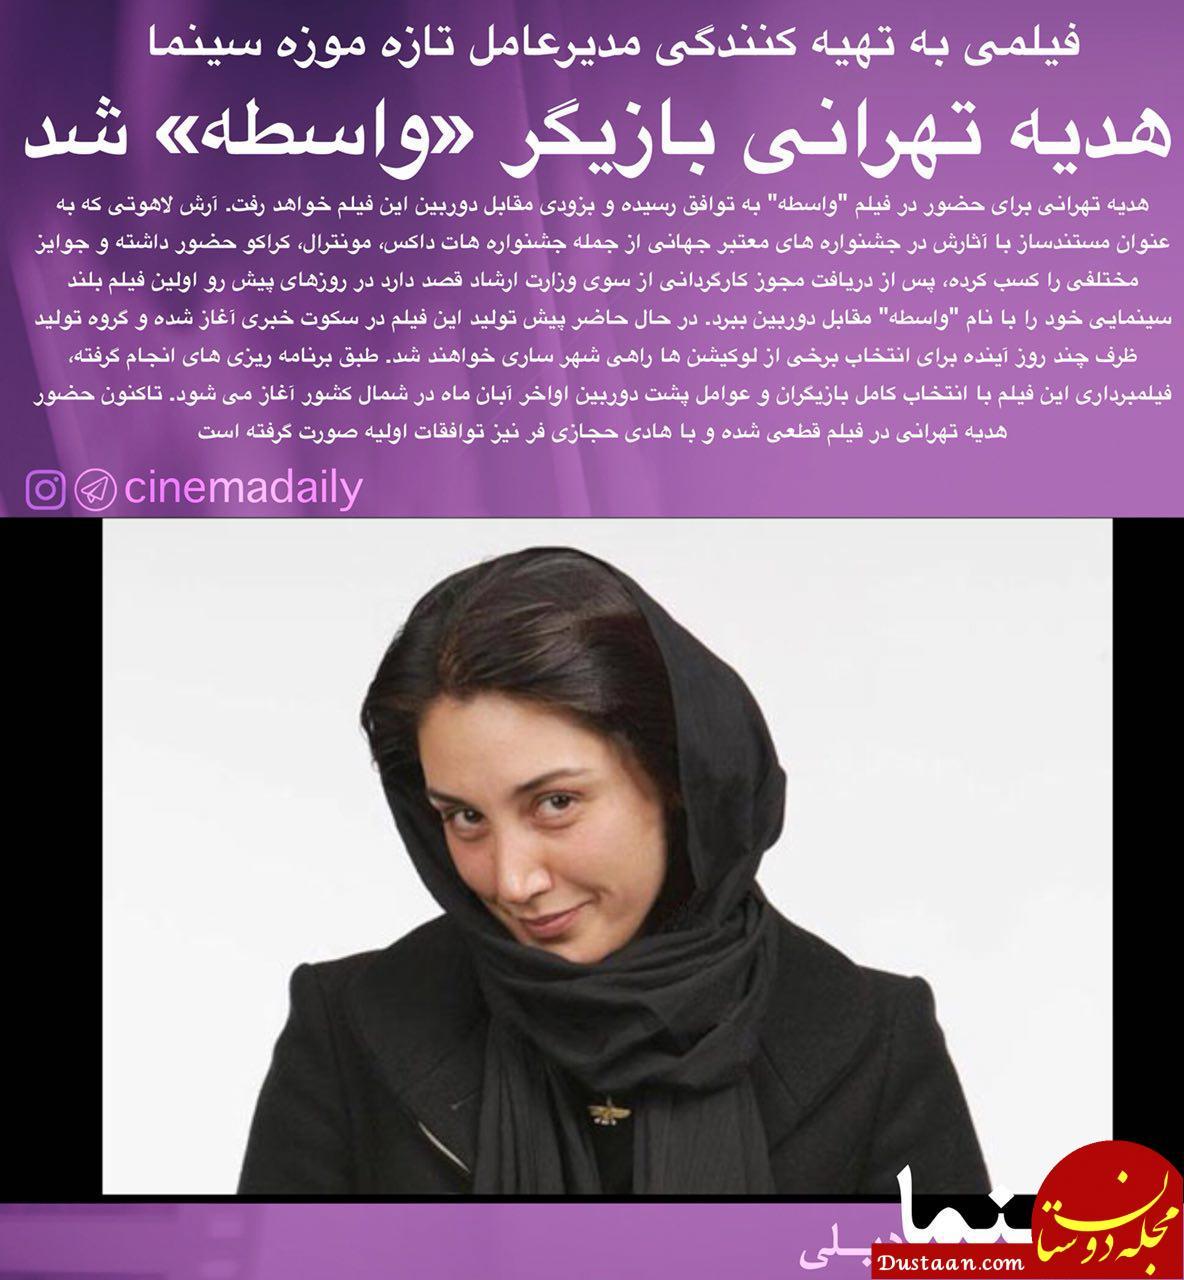 www.dustaan.com هدیه تهرانی بازیگر «واسطه» شد /عکس